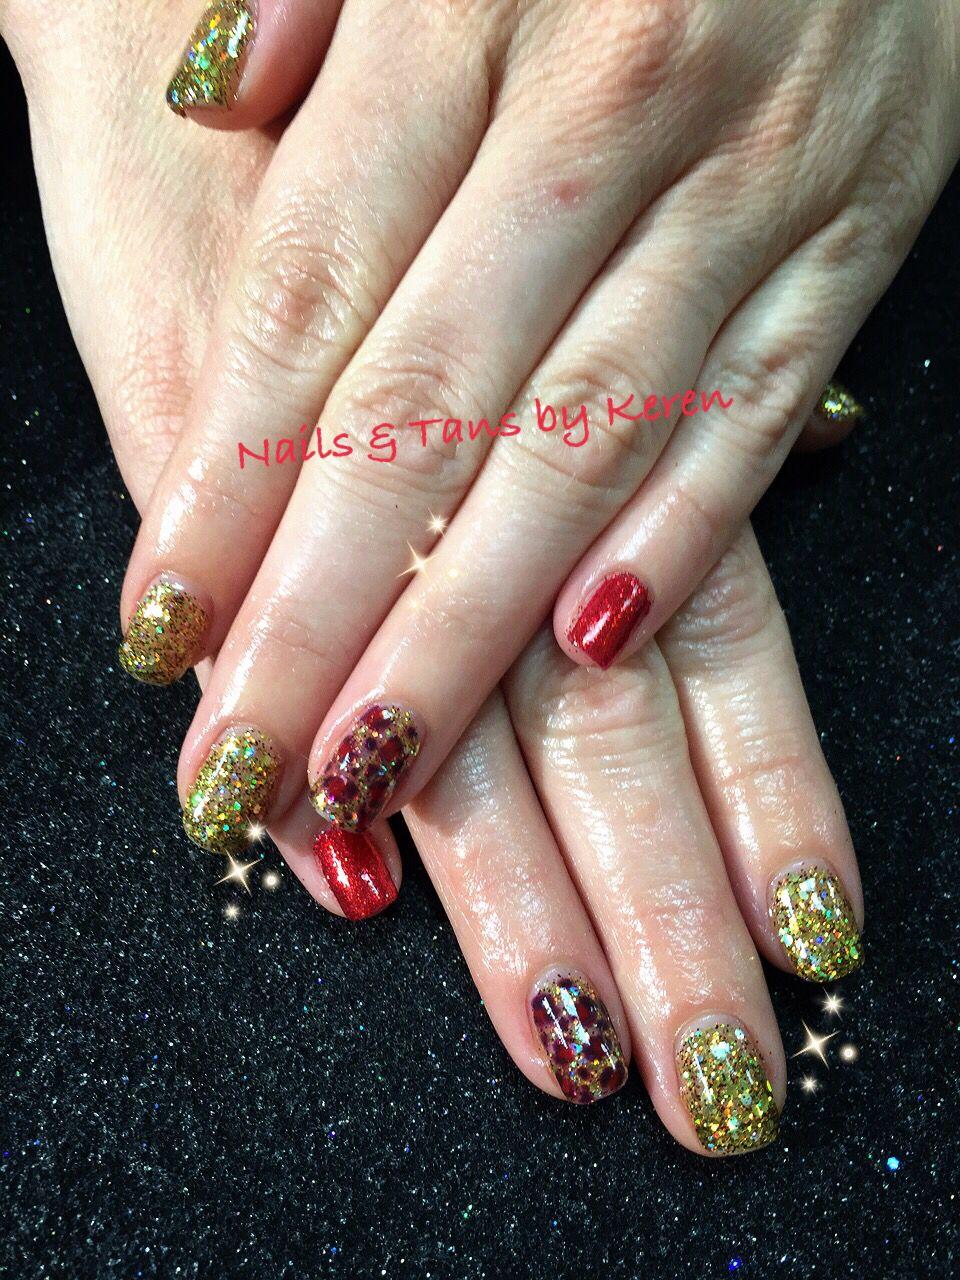 gold & red glitter combo. Fall nails 2014 | Nail Addict | Pinterest ...